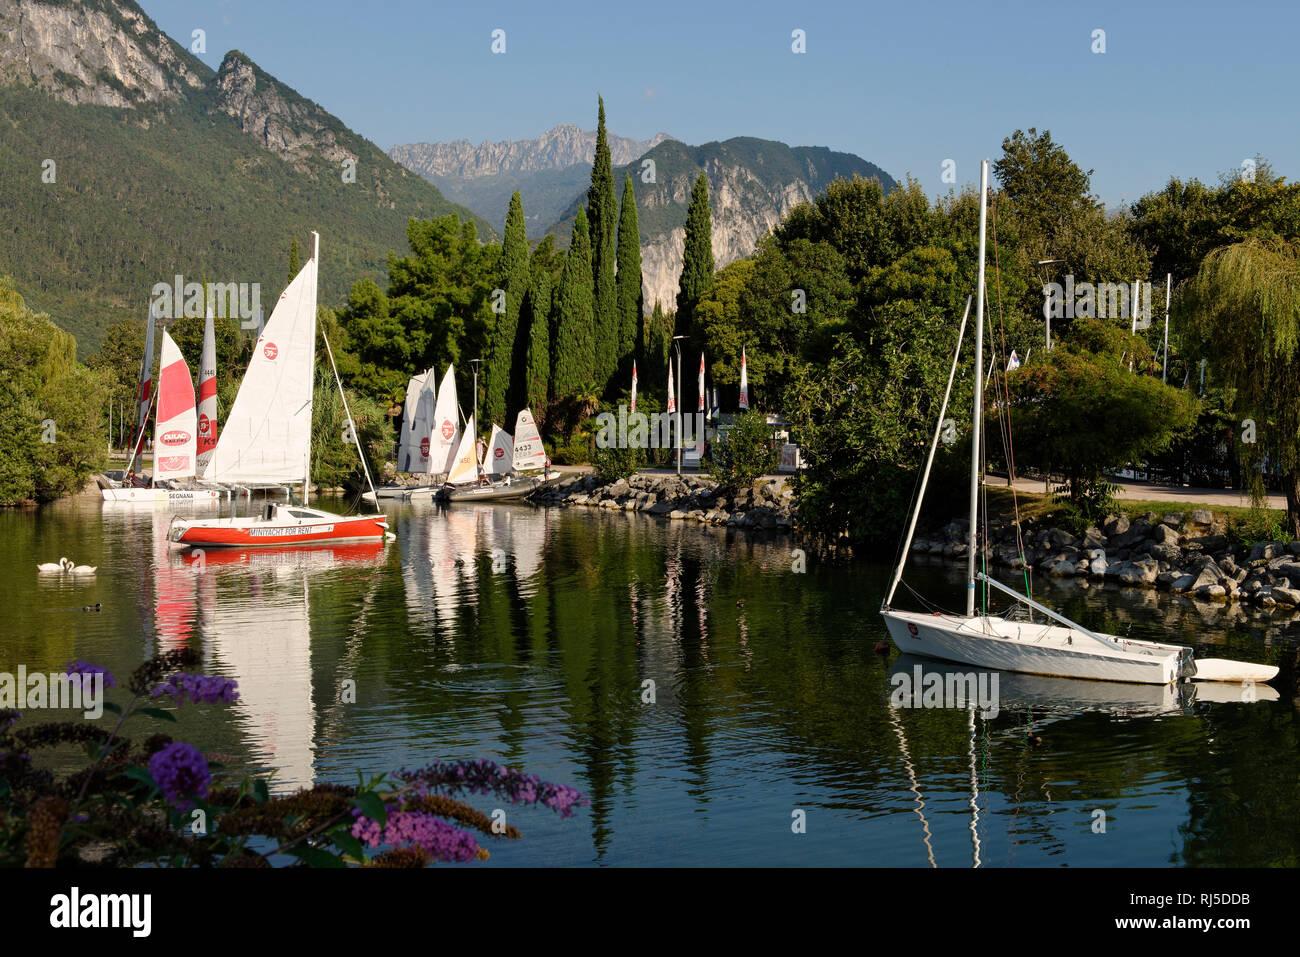 Bootshafen in Riva del Garda, Gardasee, Provinz Trento,Trentino-Südtirol, Trentino, Italien Stock Photo